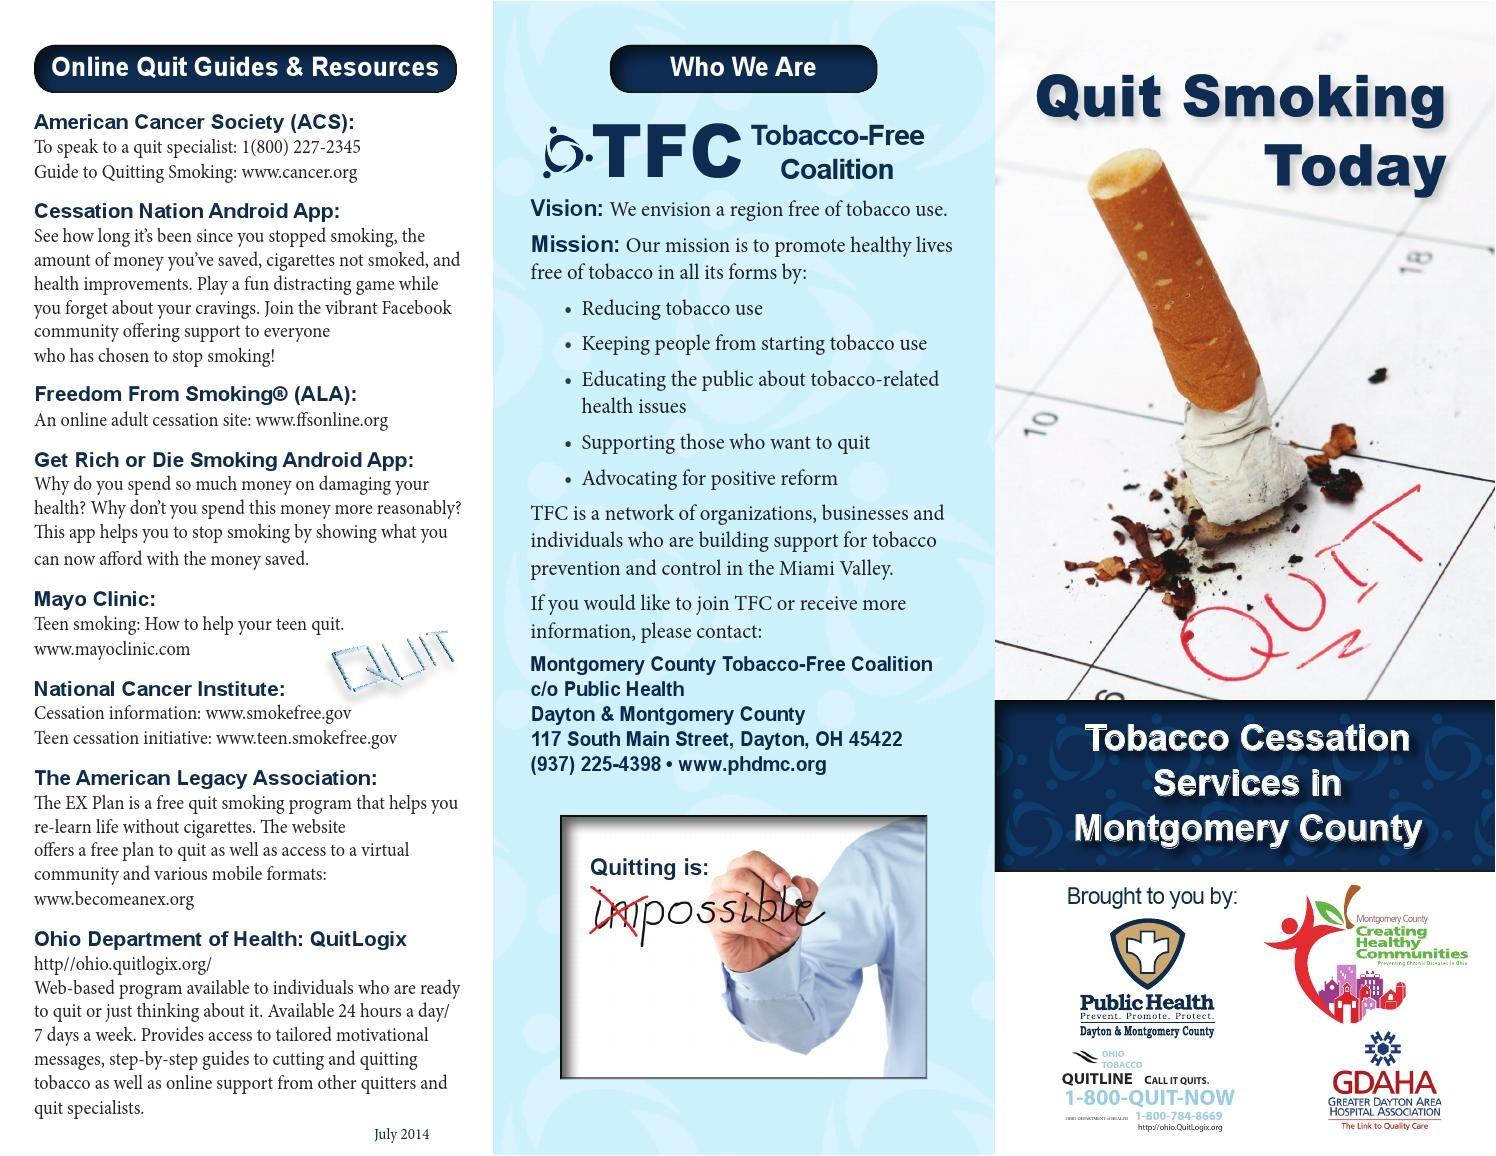 Smoking Brochure Template Smoking Cessation Brochures Xxx Porn Library